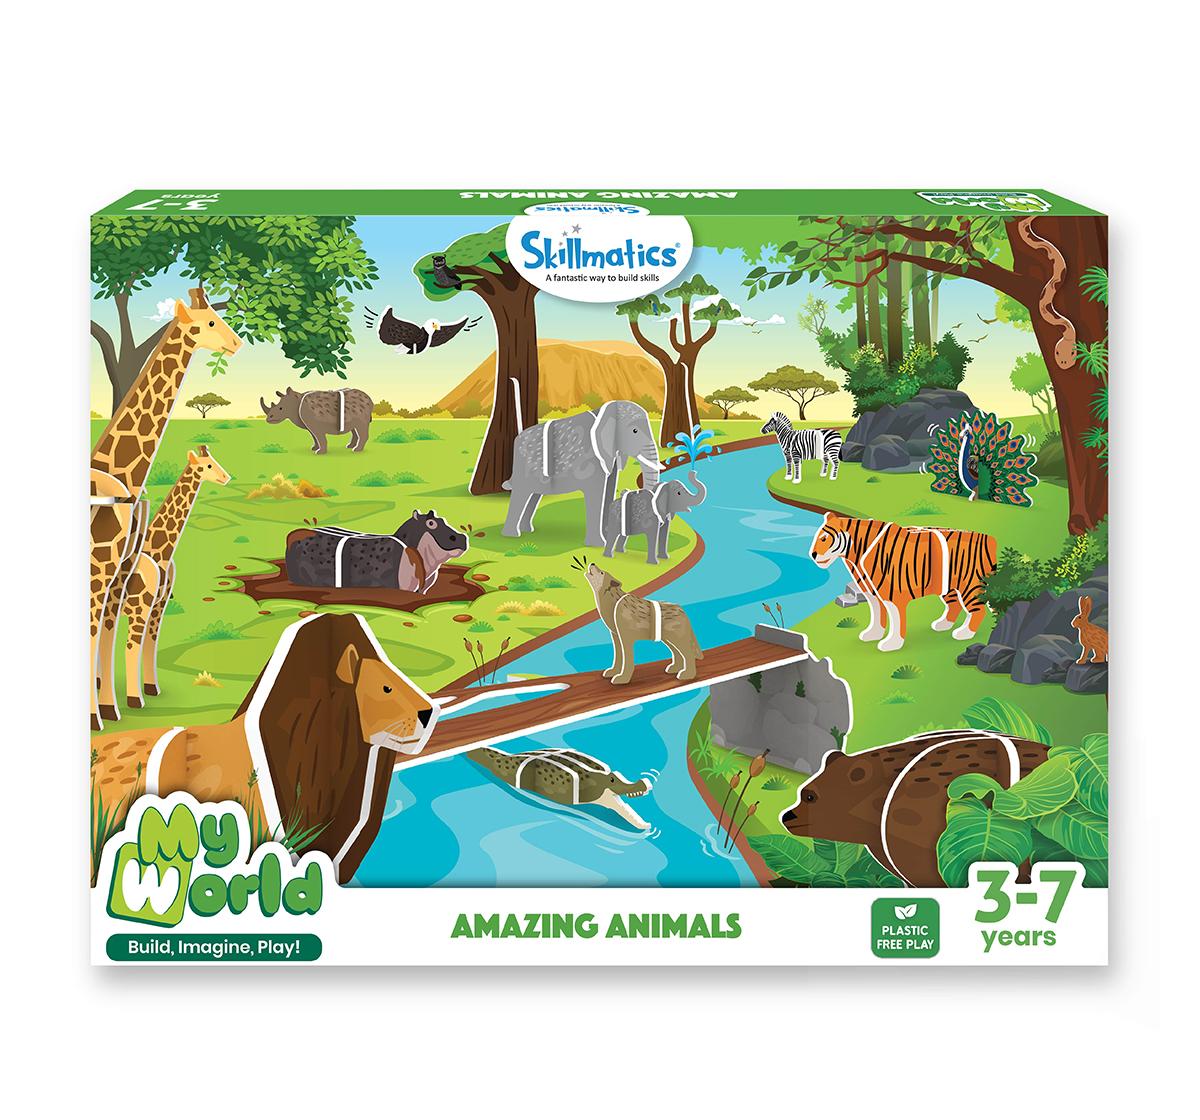 Skillmatics | Skillmatics My World Amazing Animals Building Playset, Multicolor, 3Y+